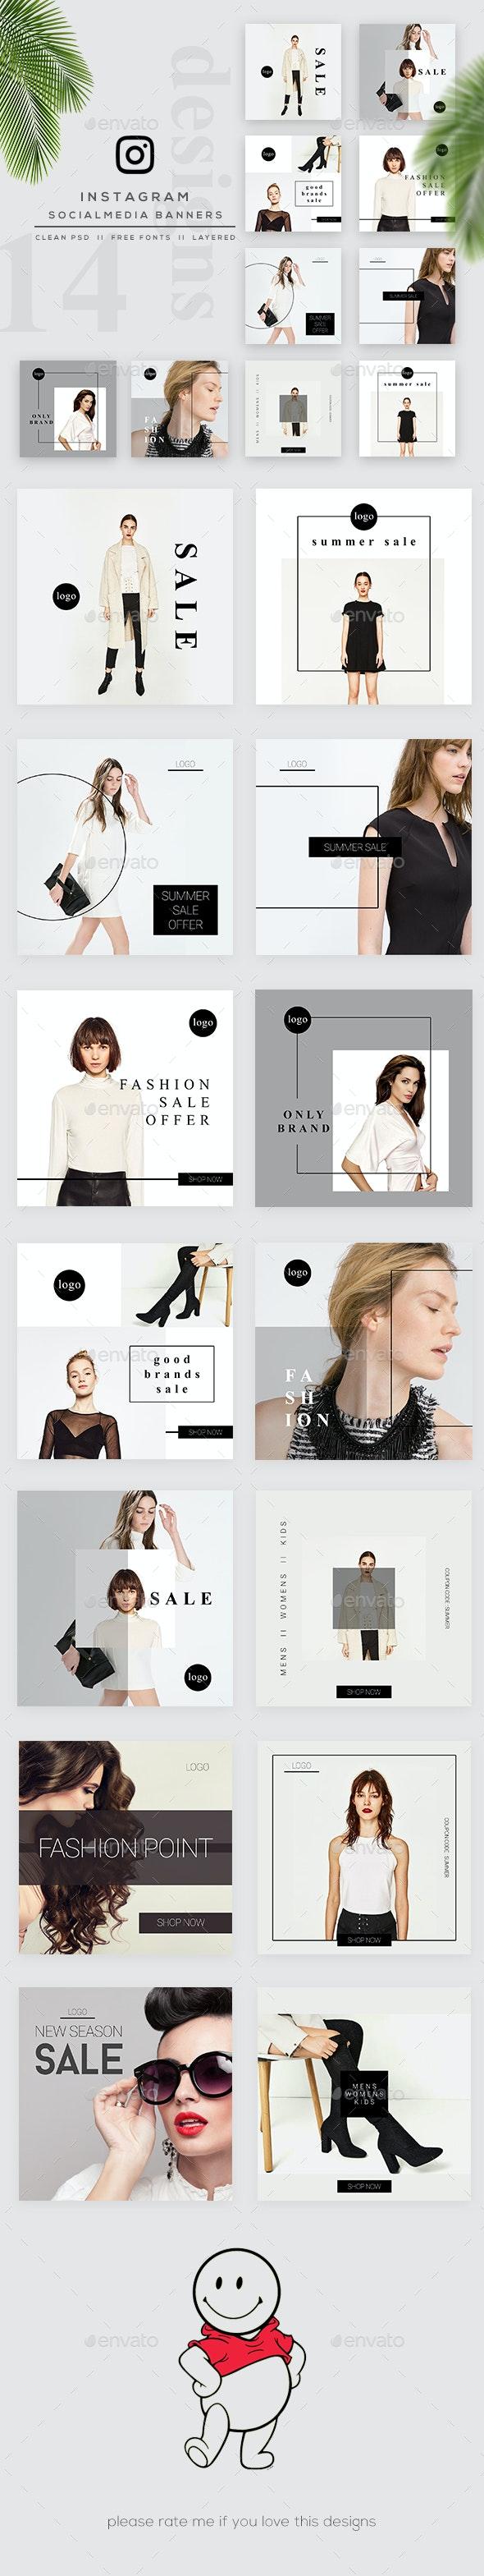 Fashion Instagram Banner Pack - Social Media Web Elements